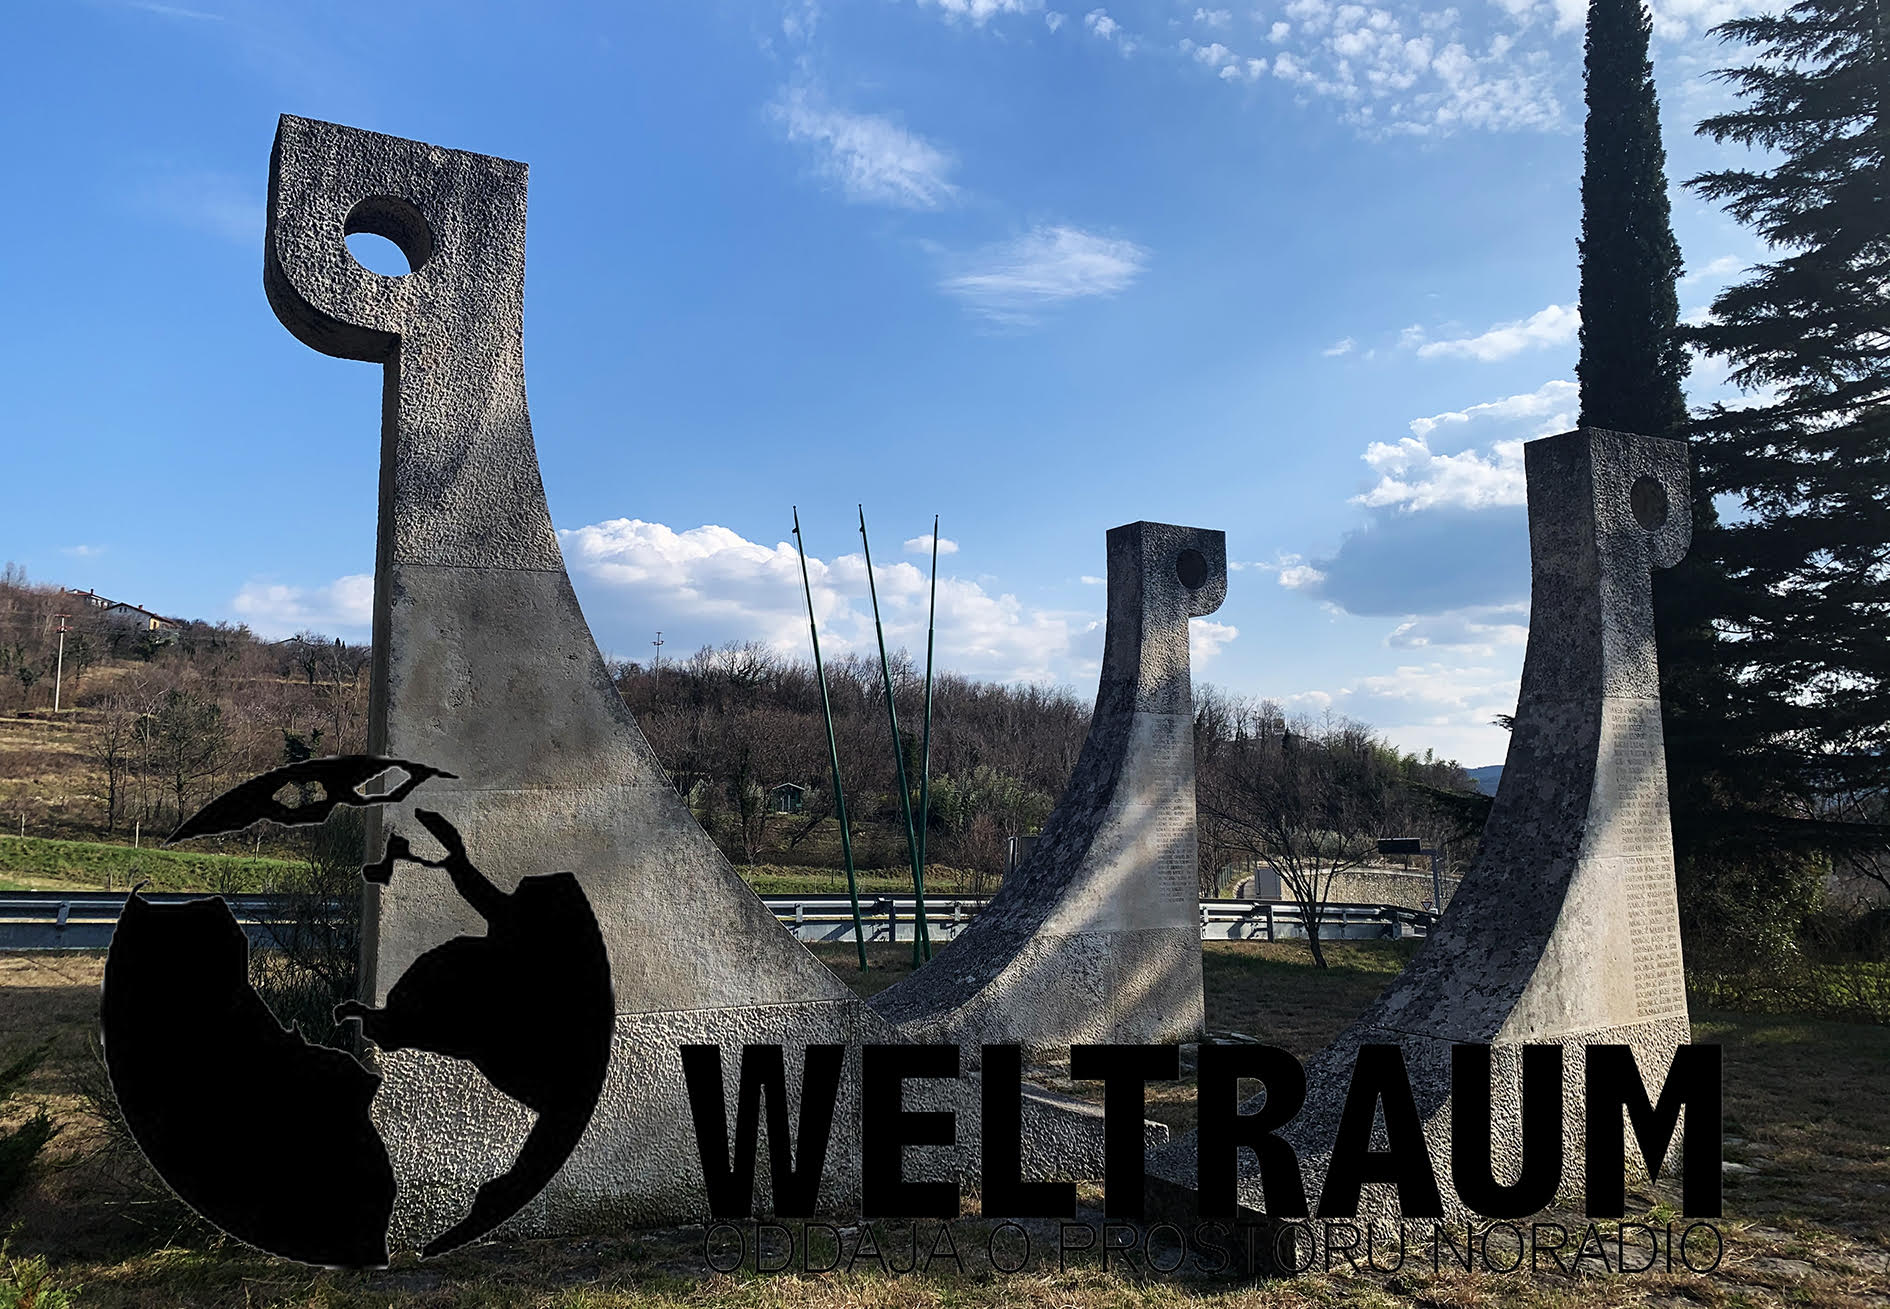 WELTRAUM 014/2021<br>Architecture. Sculpture. Remembrance.